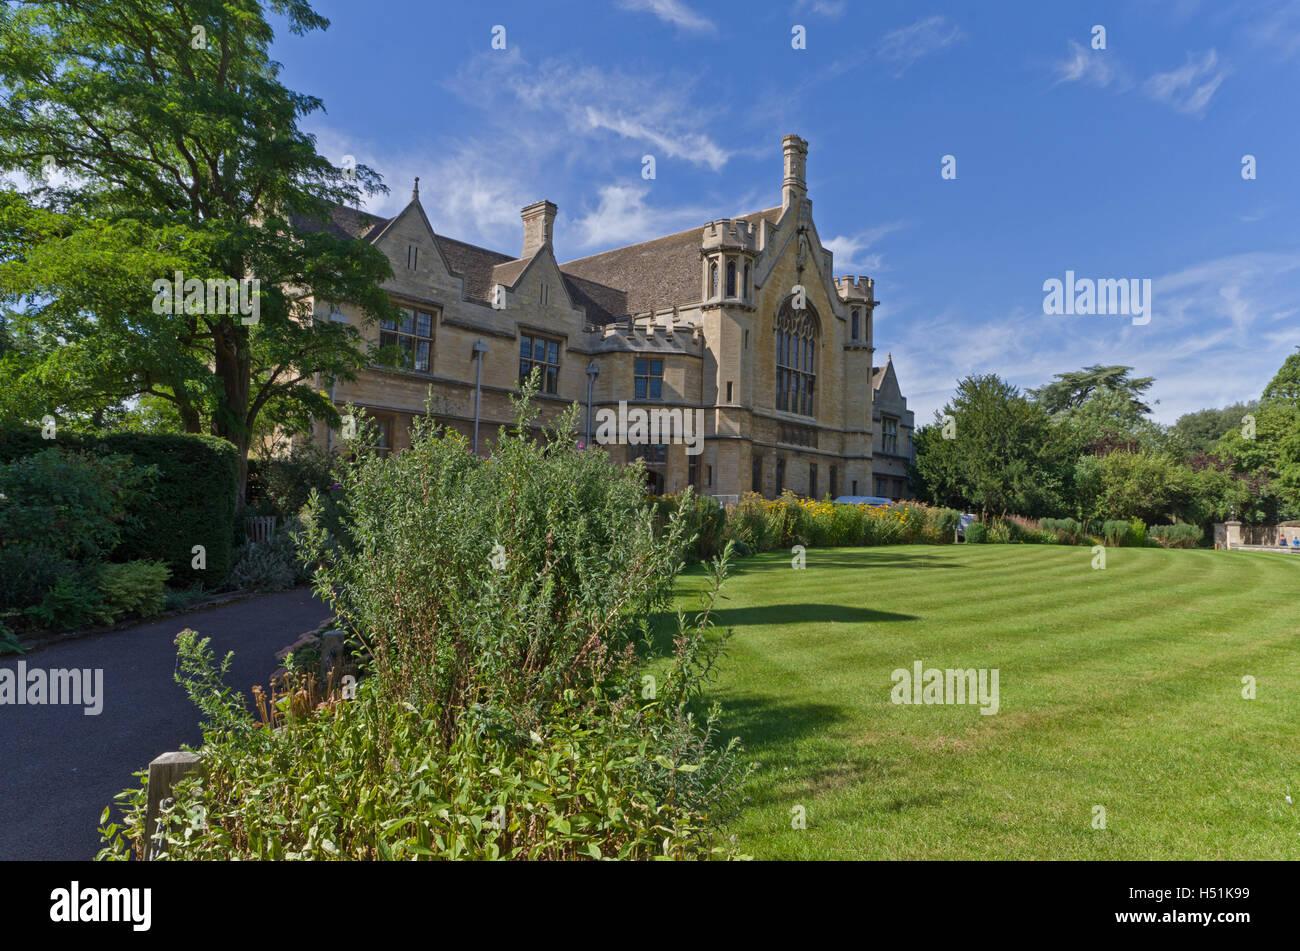 The Great Hall, Oundle School, Northamptonshire, UK - Stock Image